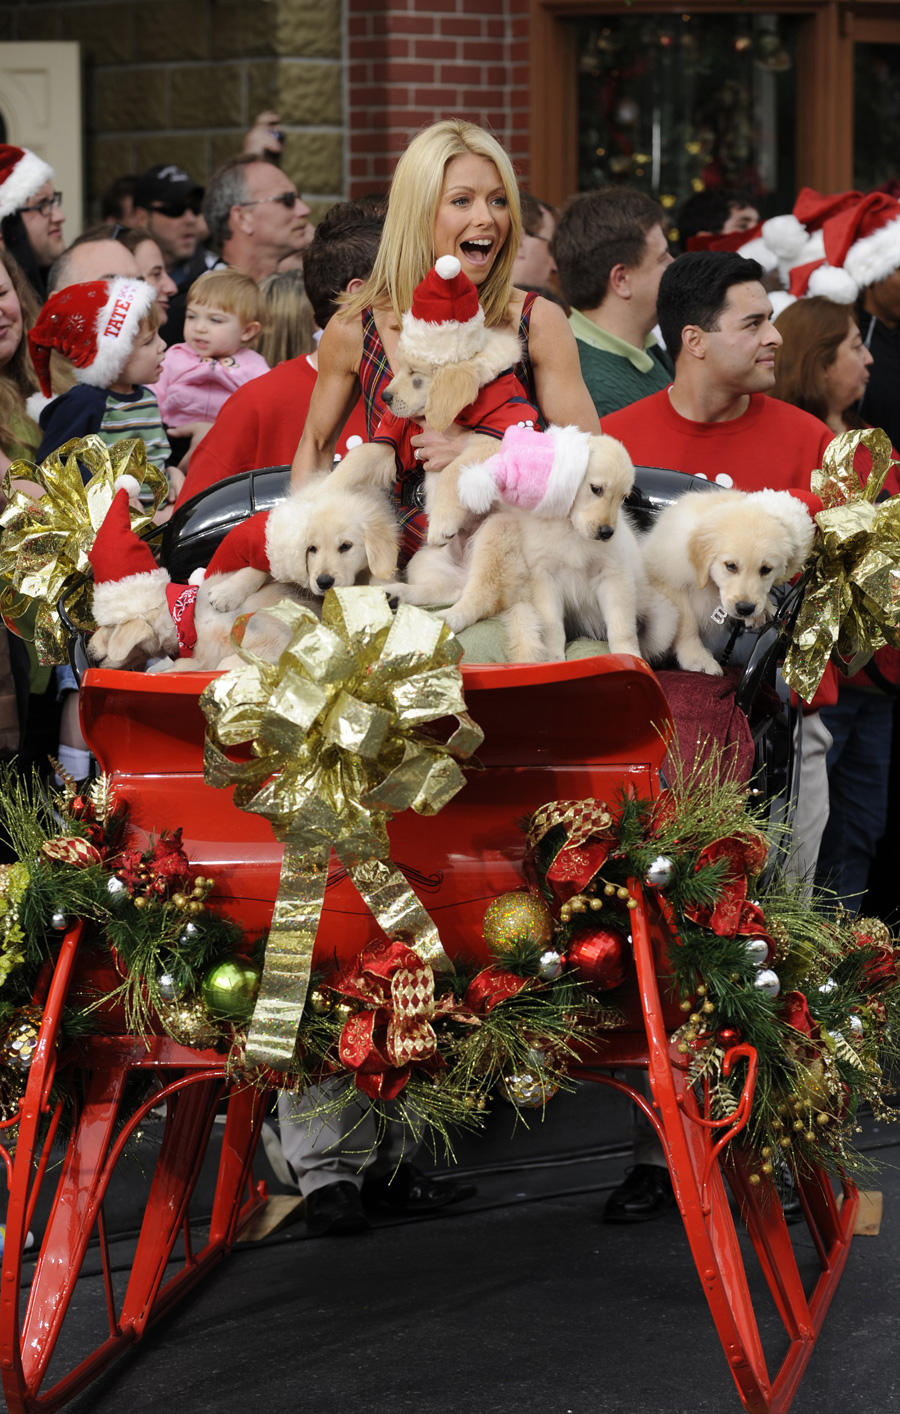 disney parks christmas day parade airs december 25 disney parks blog. Black Bedroom Furniture Sets. Home Design Ideas